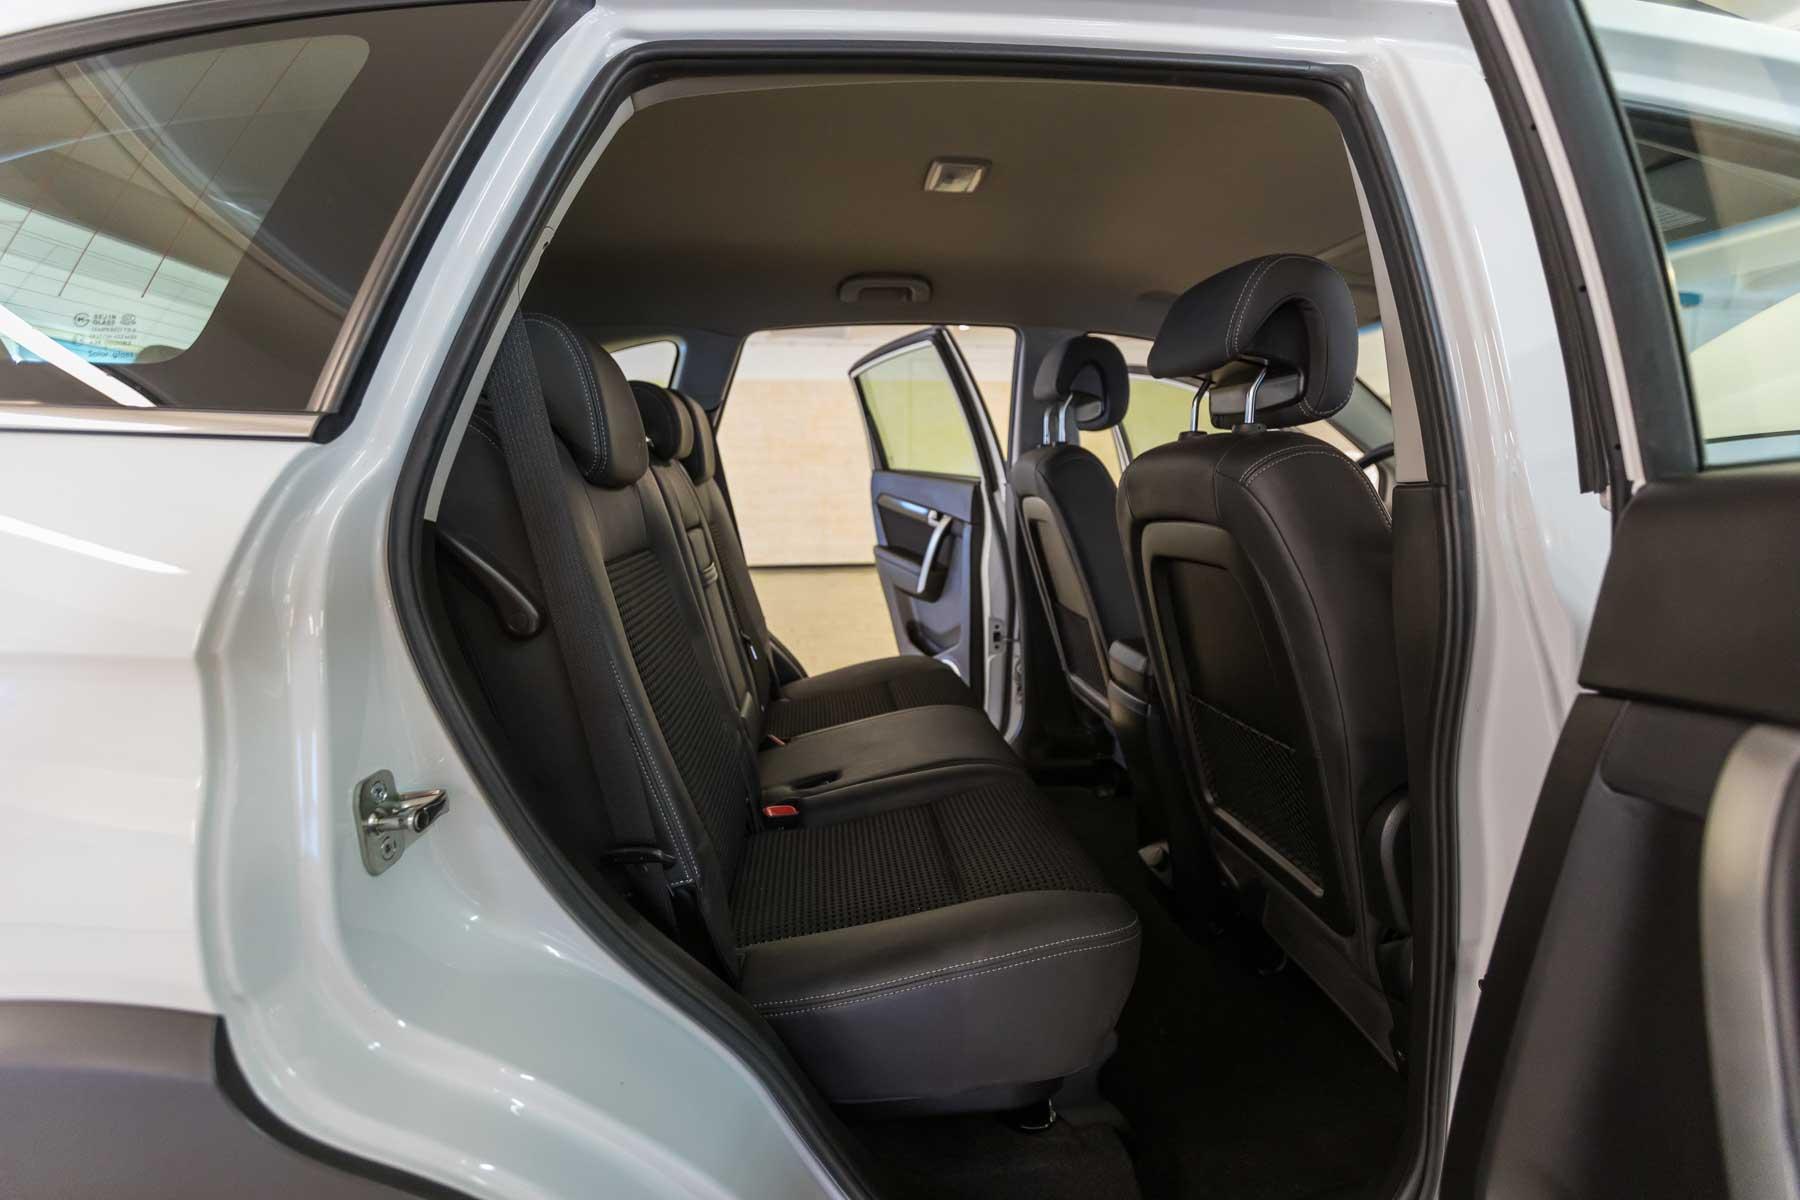 Chevrolet Interni Captiva Bianco 2wd Ls Usata Porta Posteriore